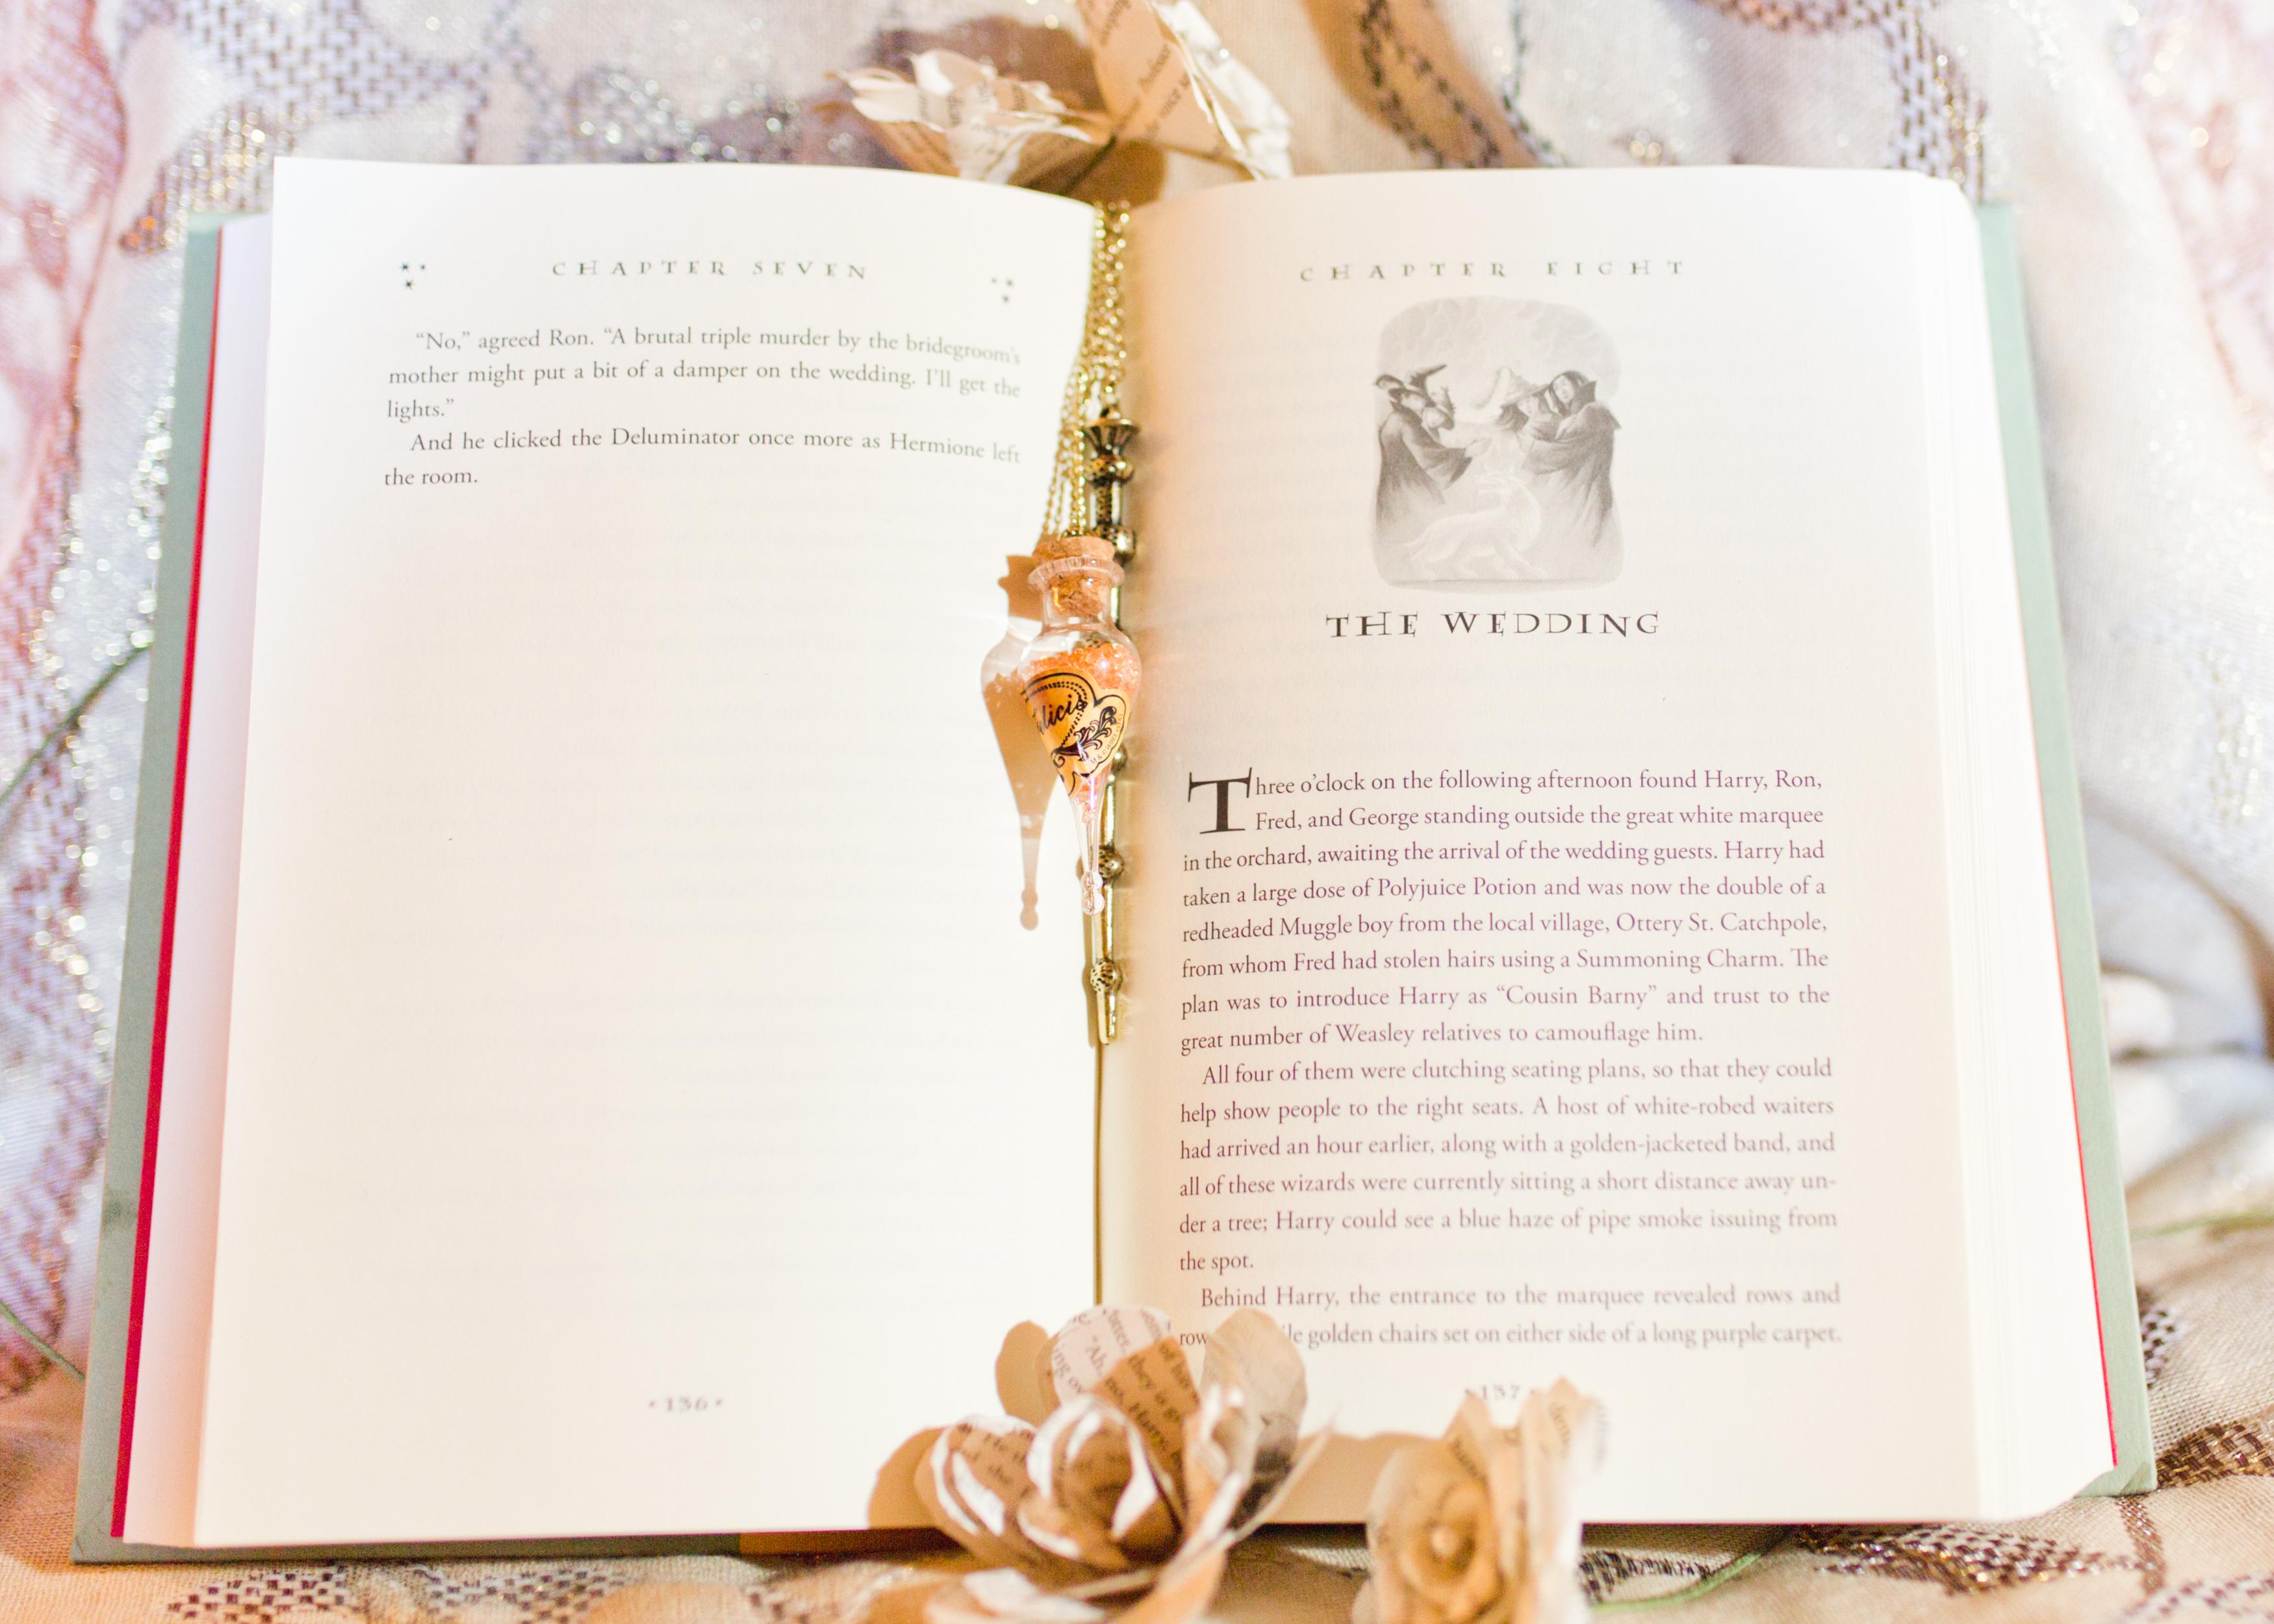 harry-potter-wedding-details-necklaces